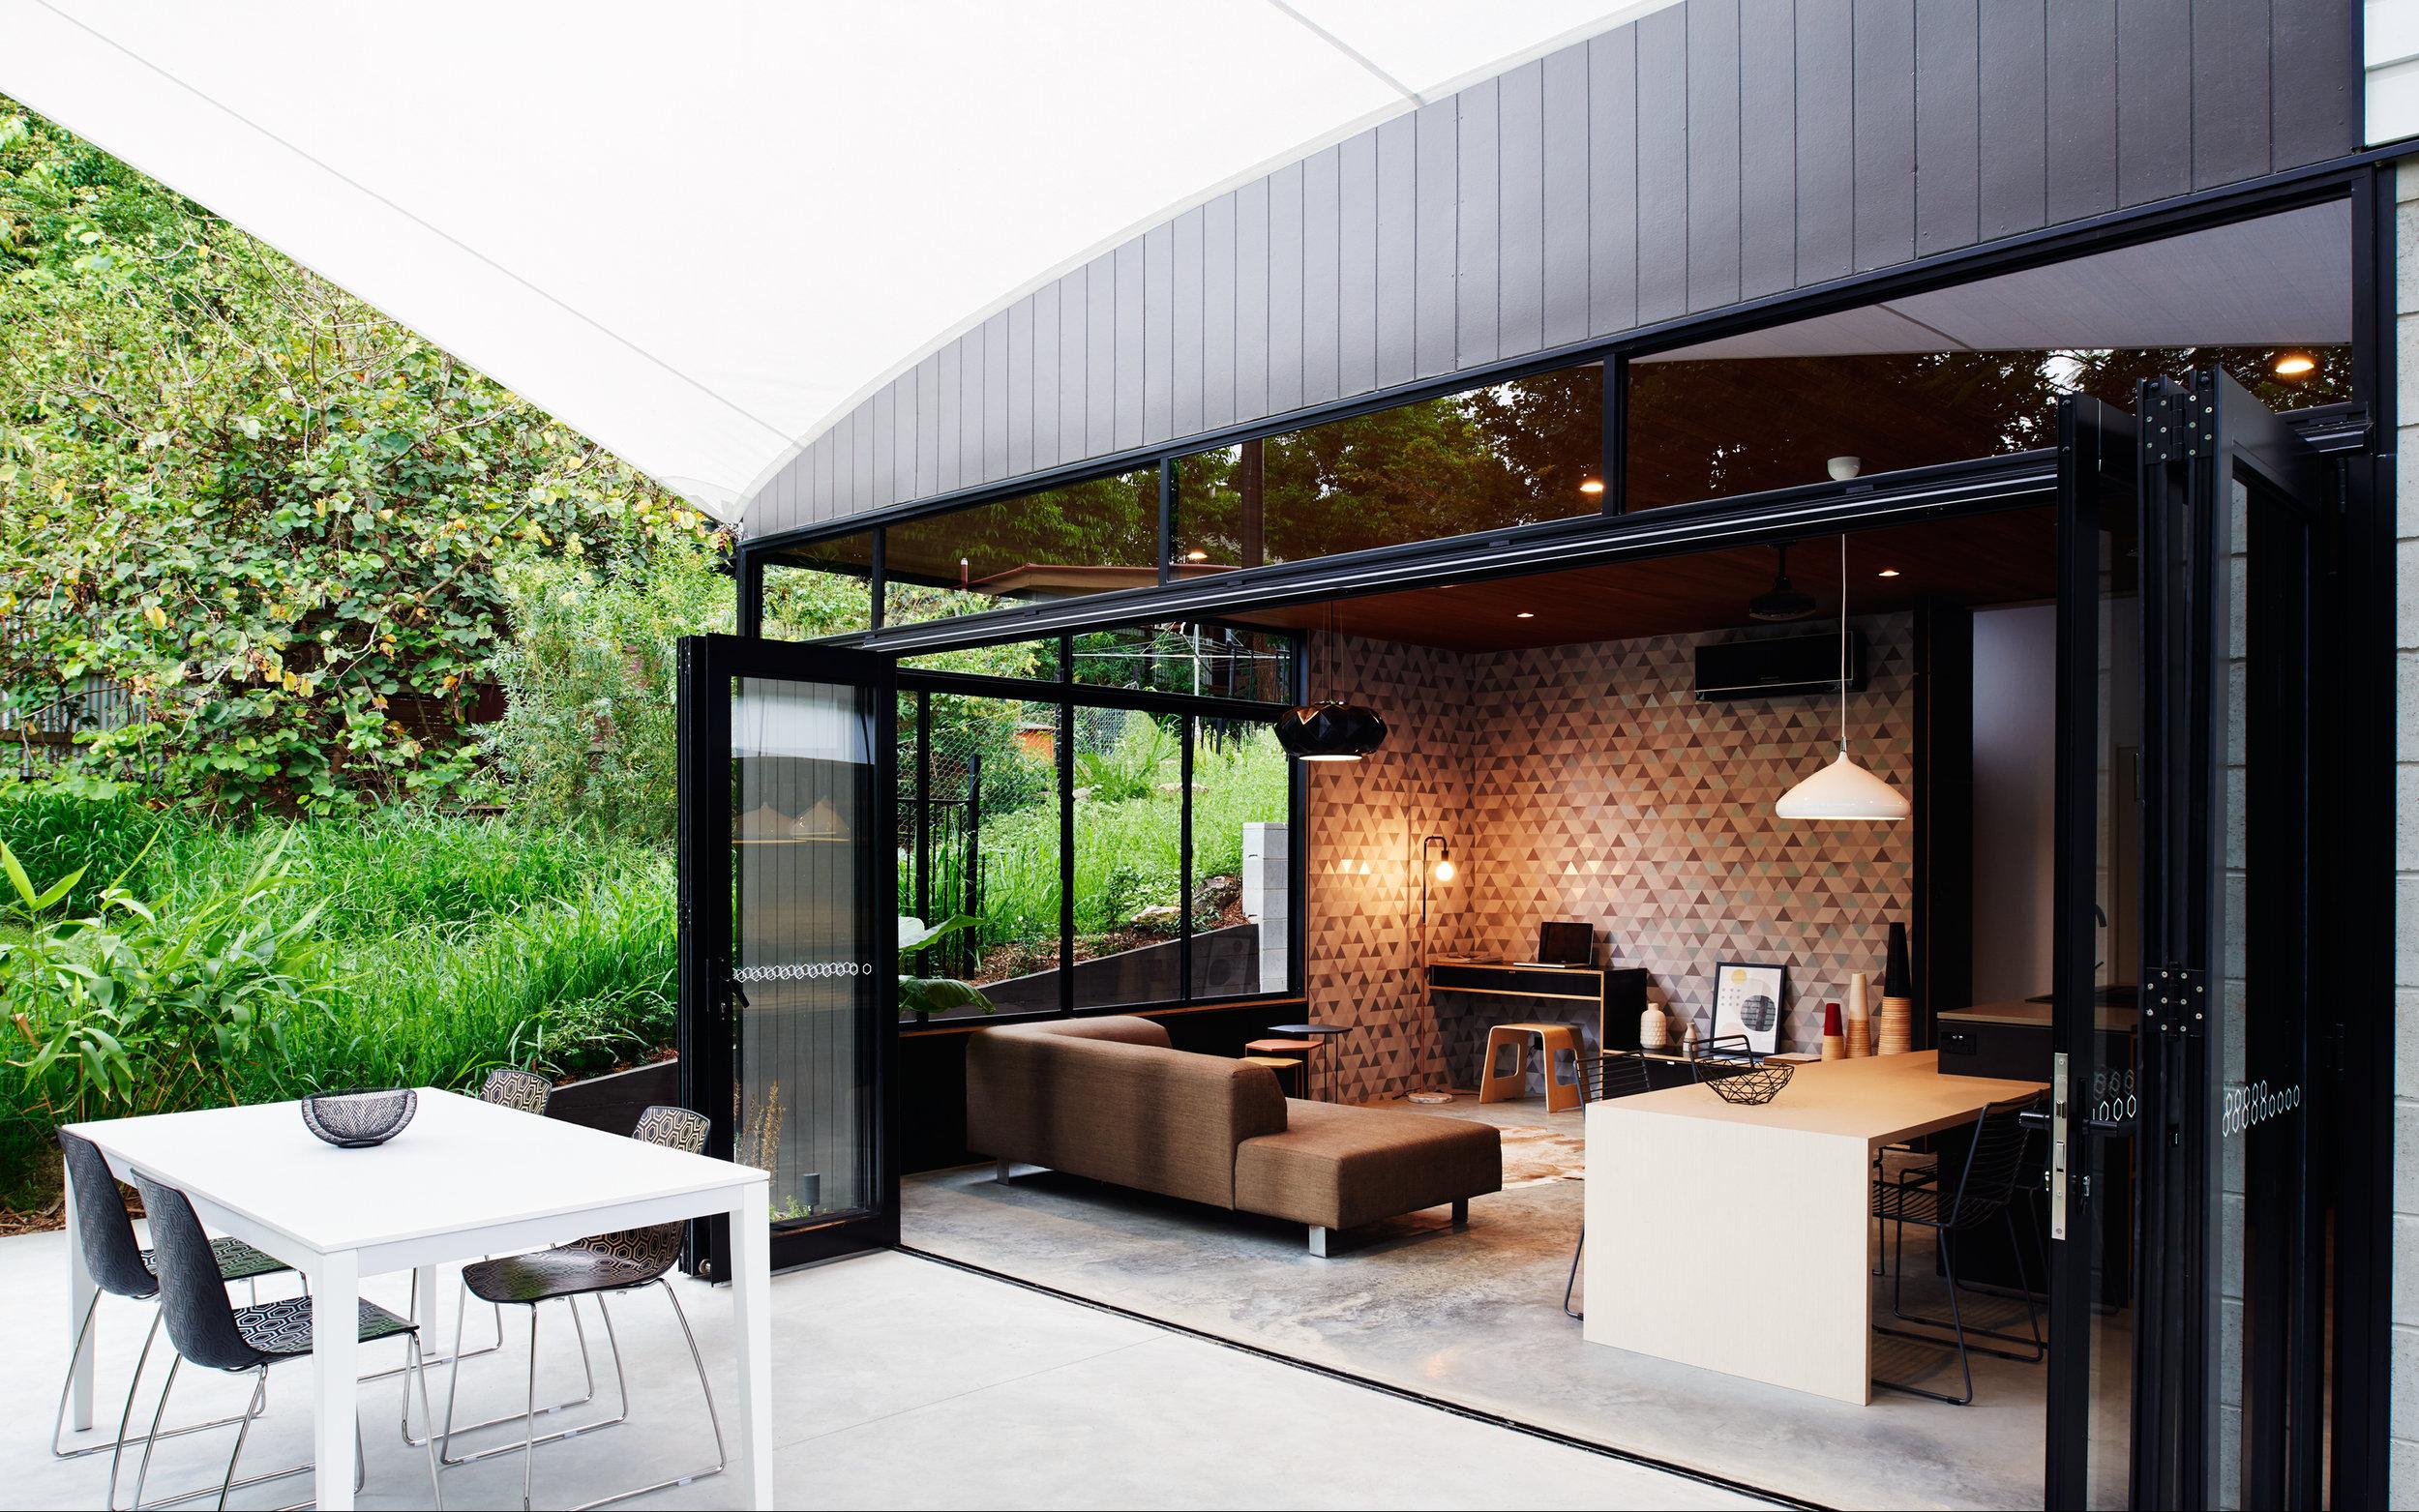 REFRESHDESIGN_Wgbba-gardenhouse_07.jpg